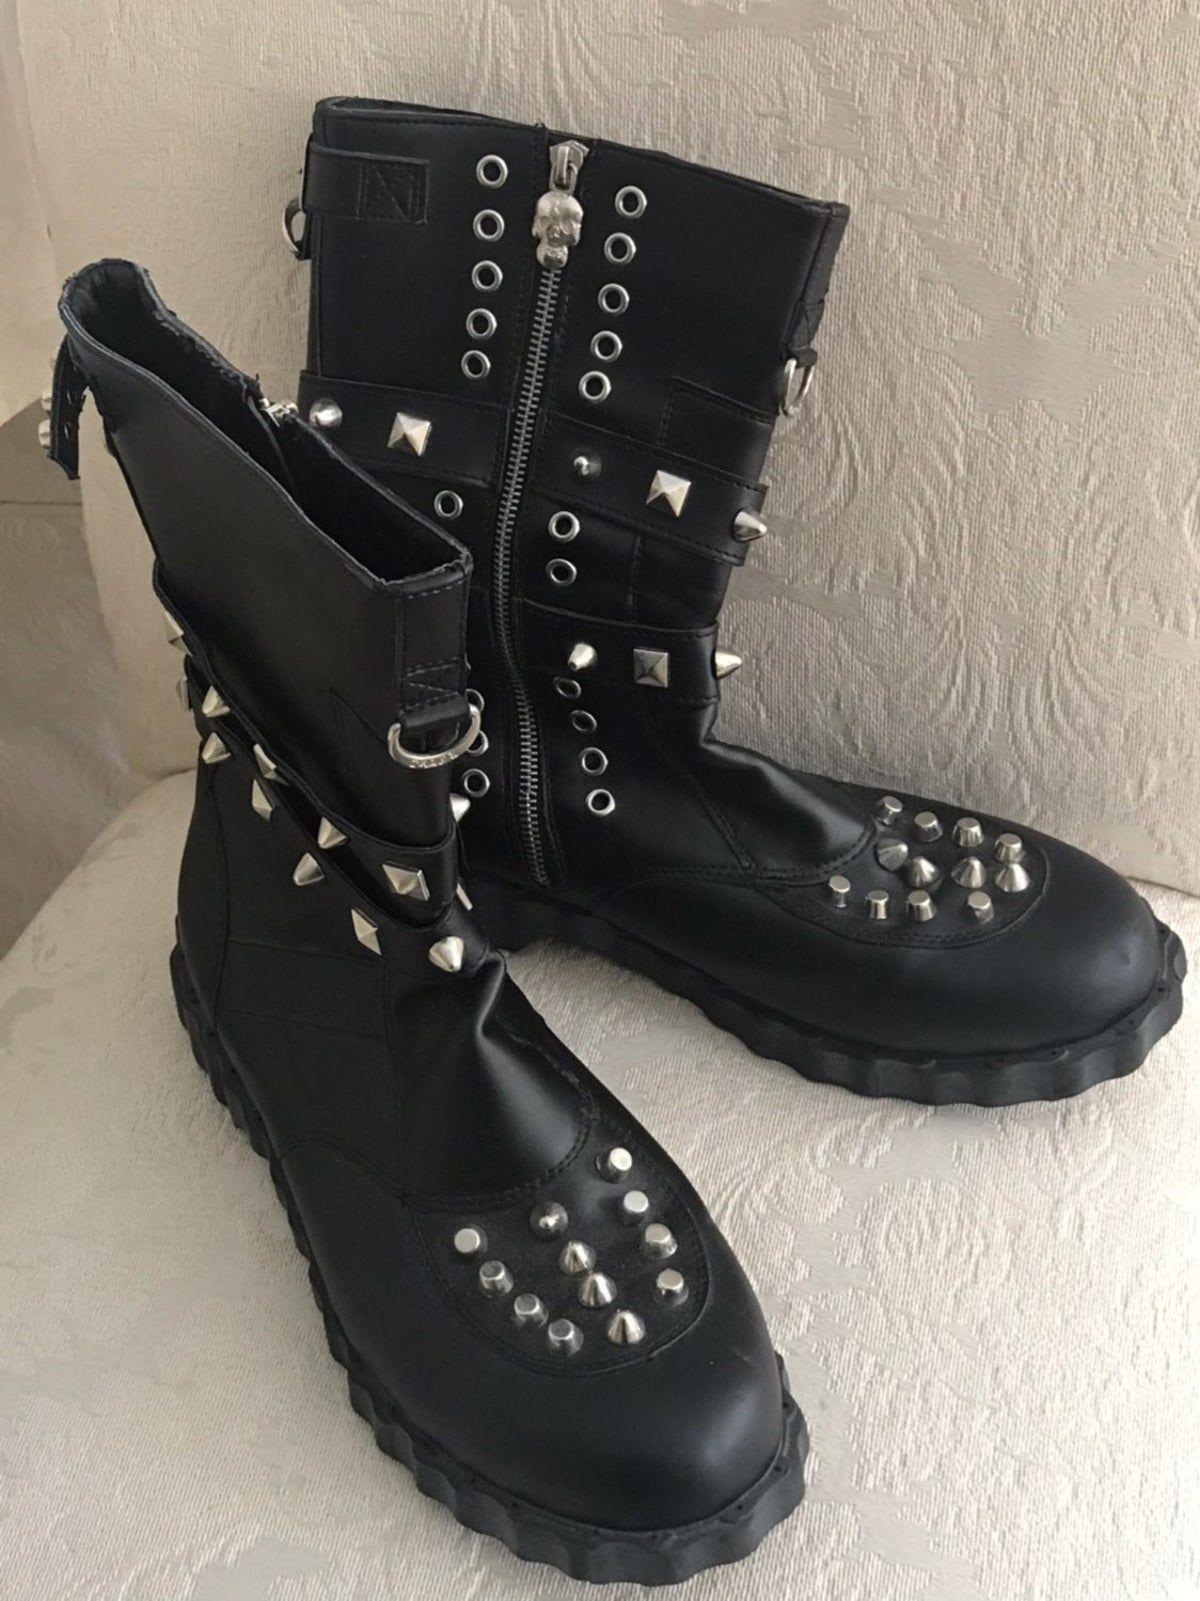 Size 11 Mens Biker Boots